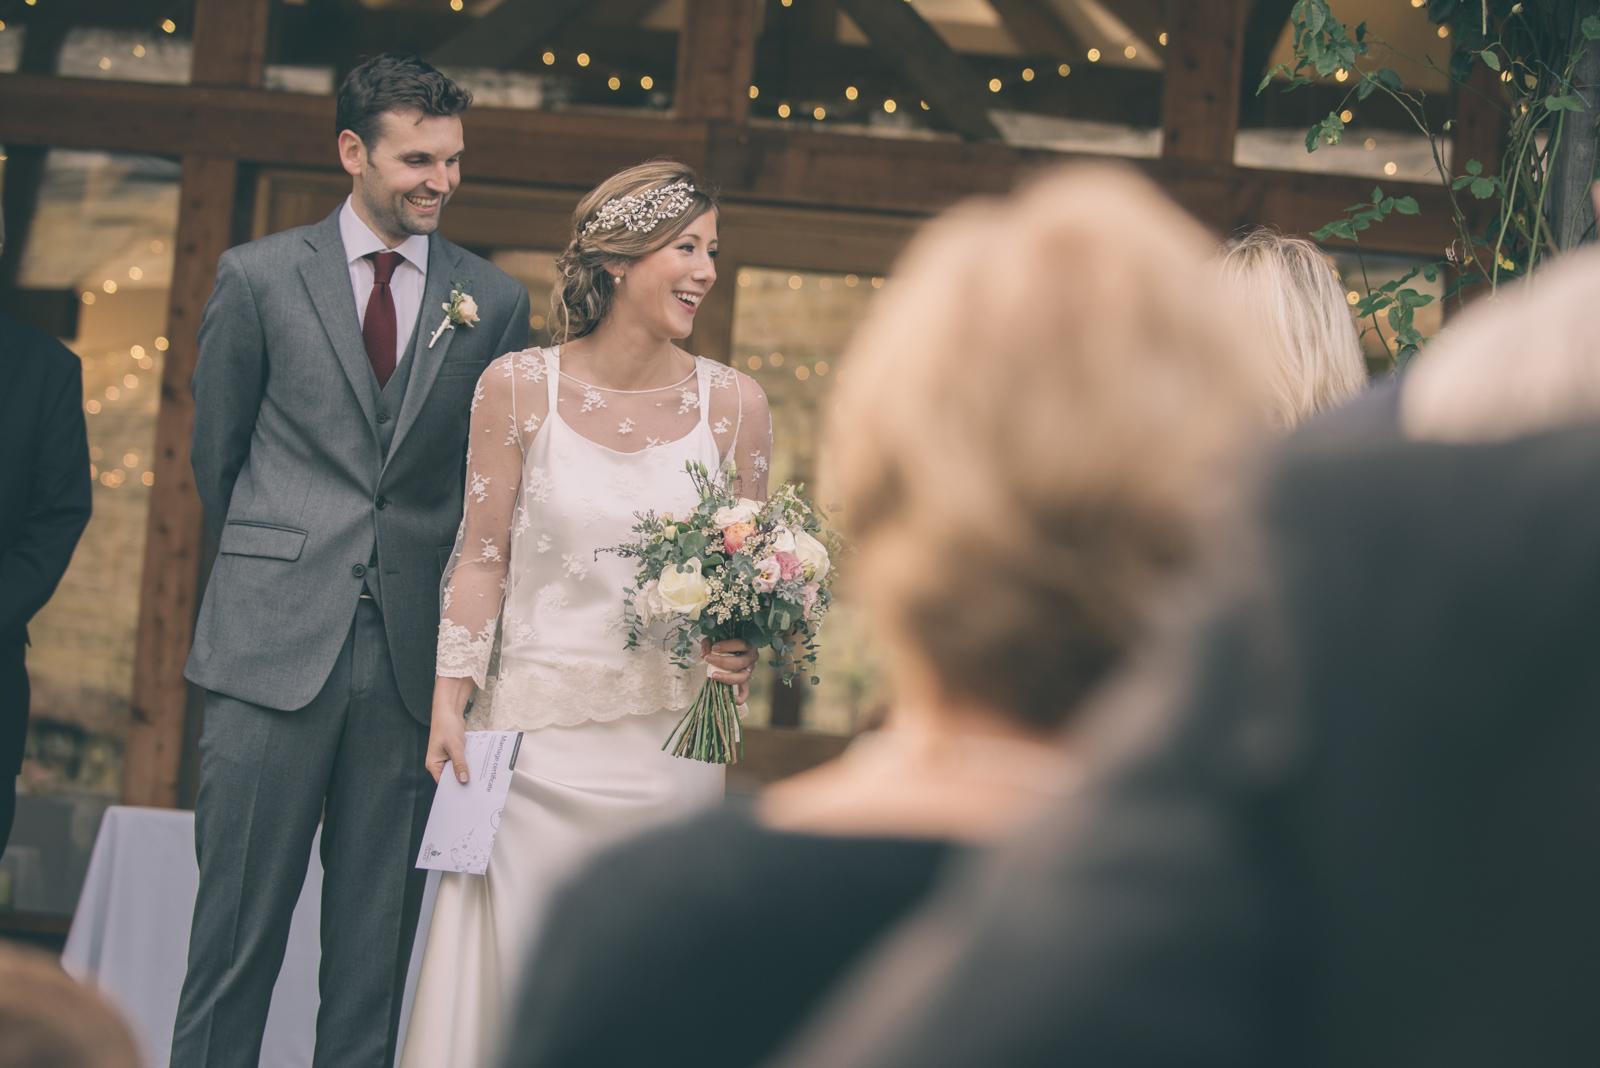 nancarrow-wedding-photography-75.jpg